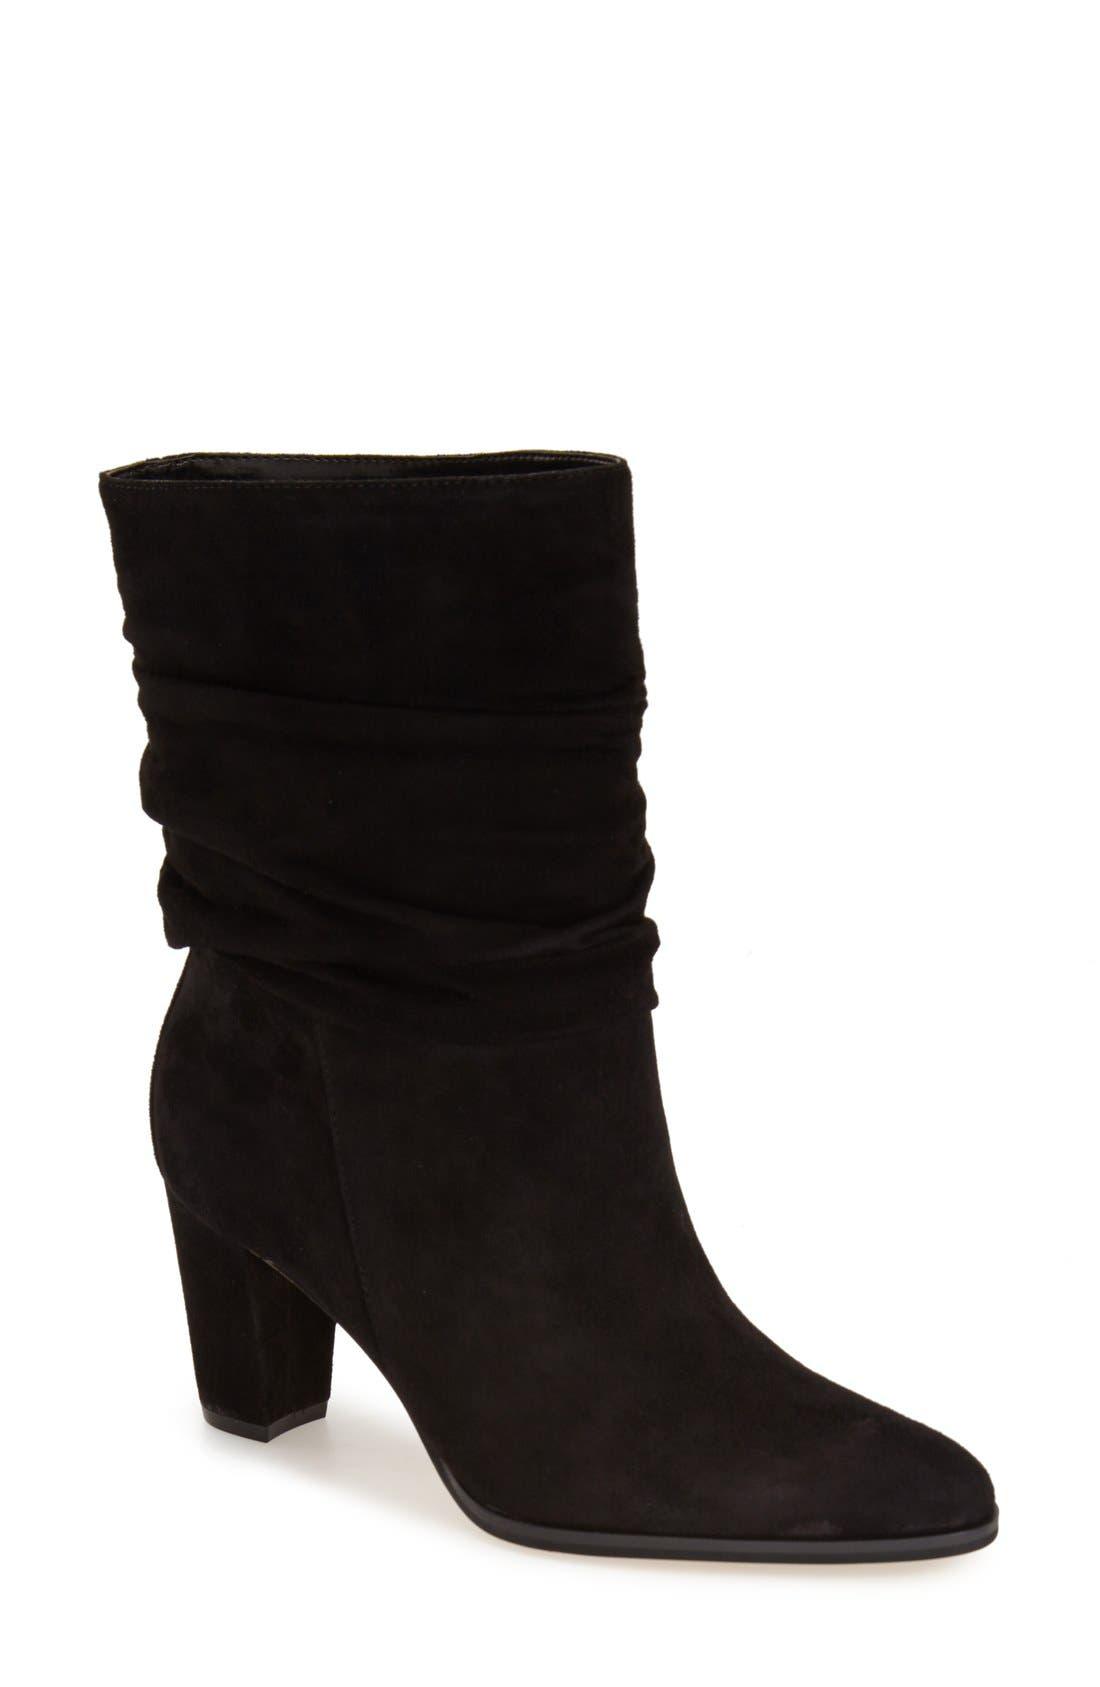 Alternate Image 1 Selected - IvankaTrump 'Jalli' Ankle Boot (Women)